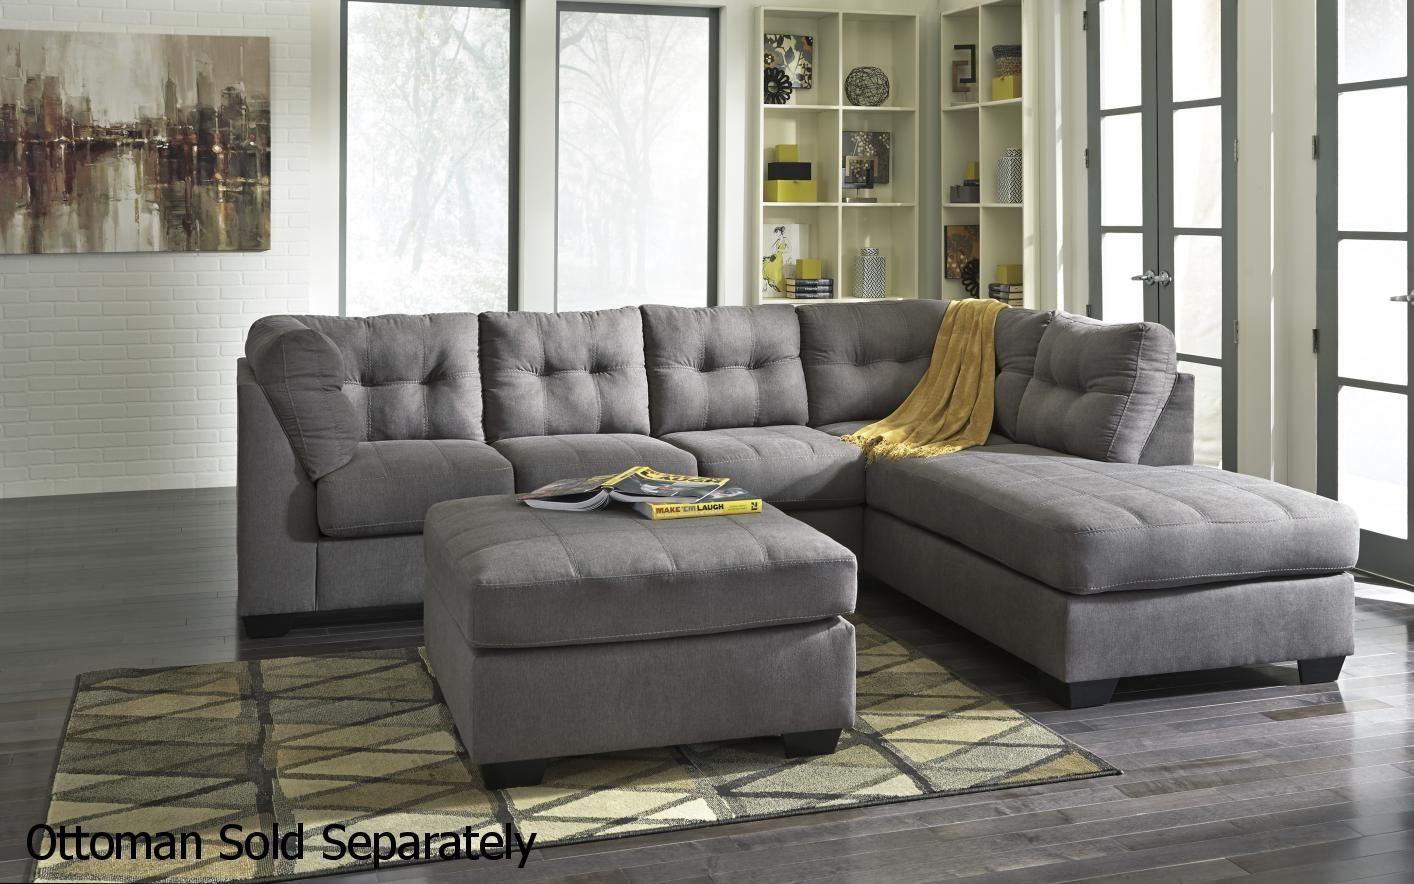 Fotos Grau Schnitt Sofa Kommode die Wahl der rechten sofa-design ...